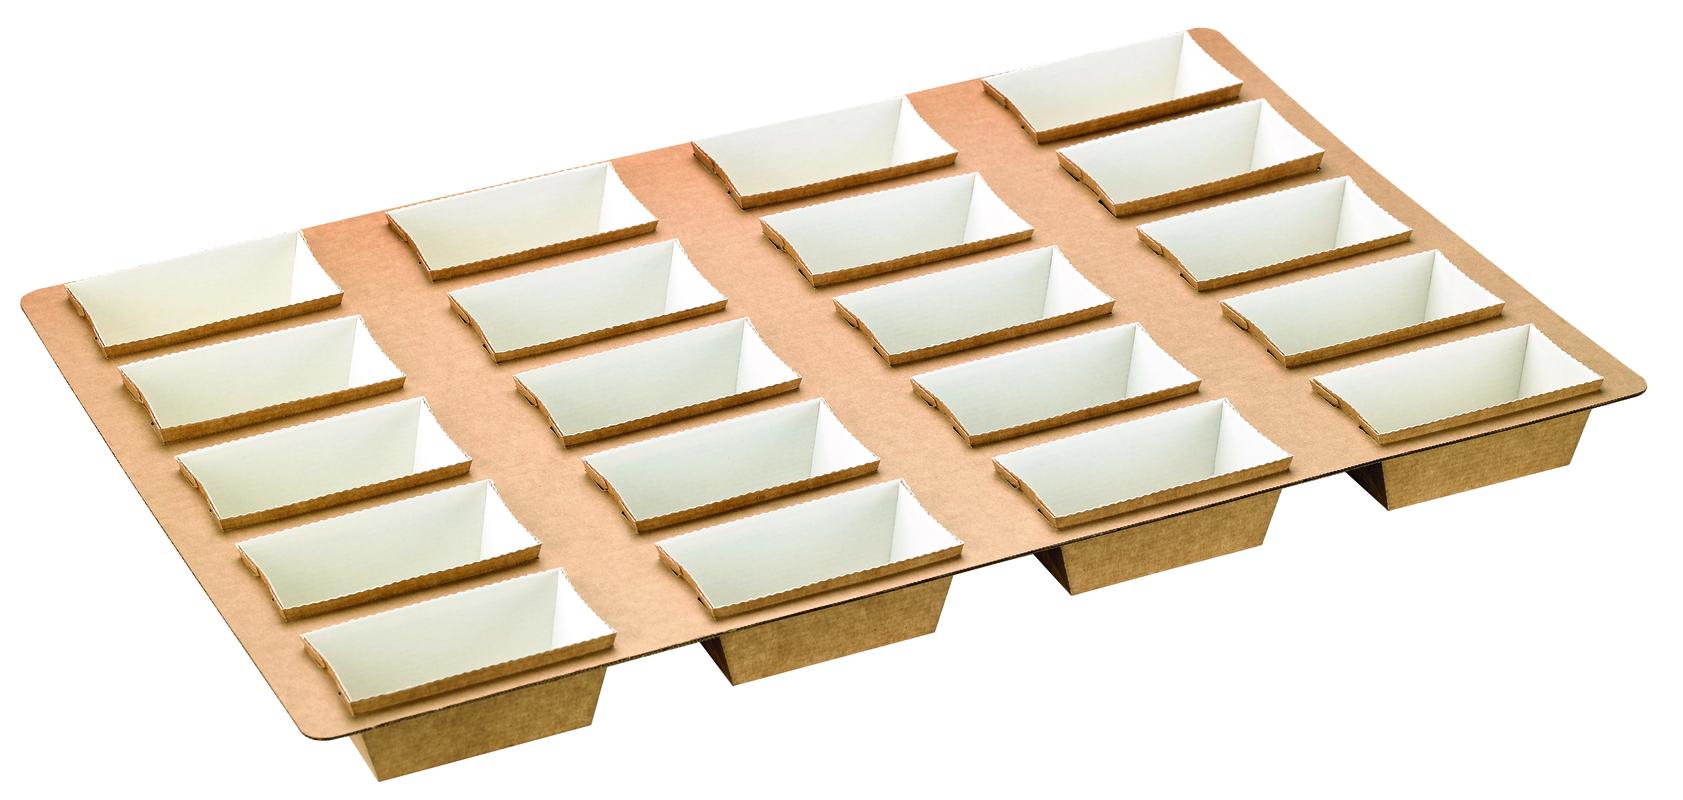 Tray rectangular baking molds - 14.2 x 22 in